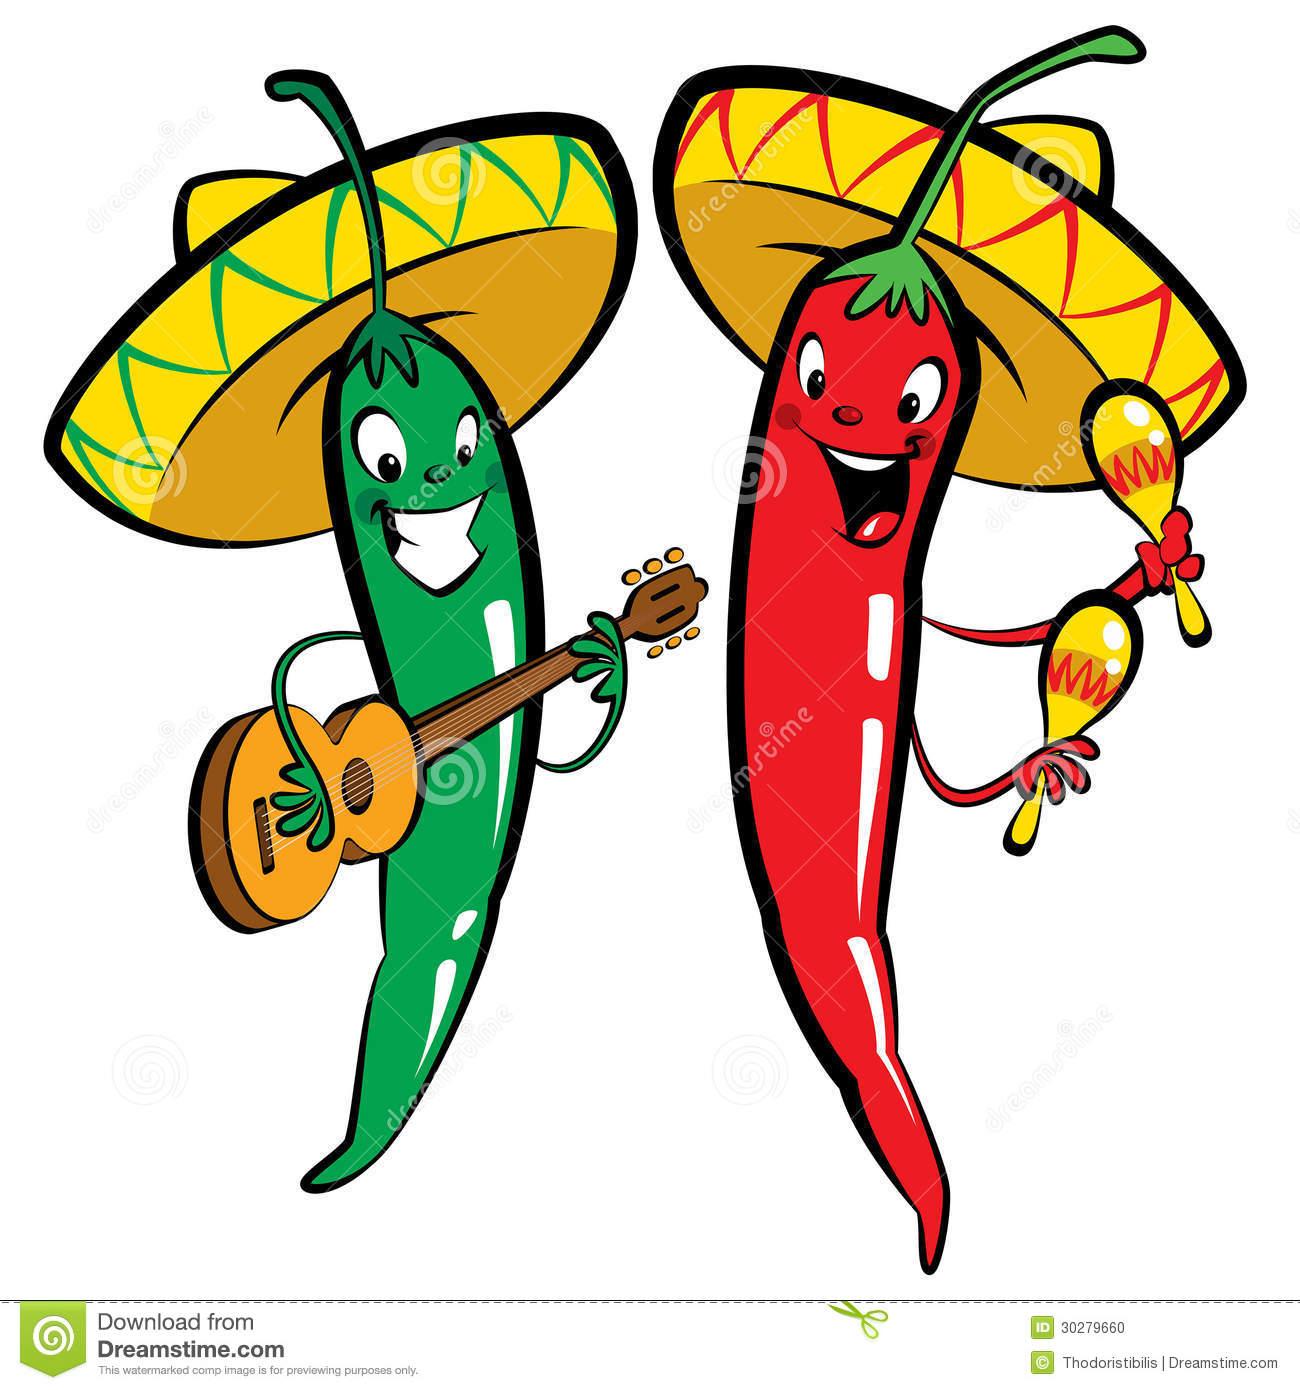 Chili clipart green capsicum  Cartoon chili Cartoon peppers